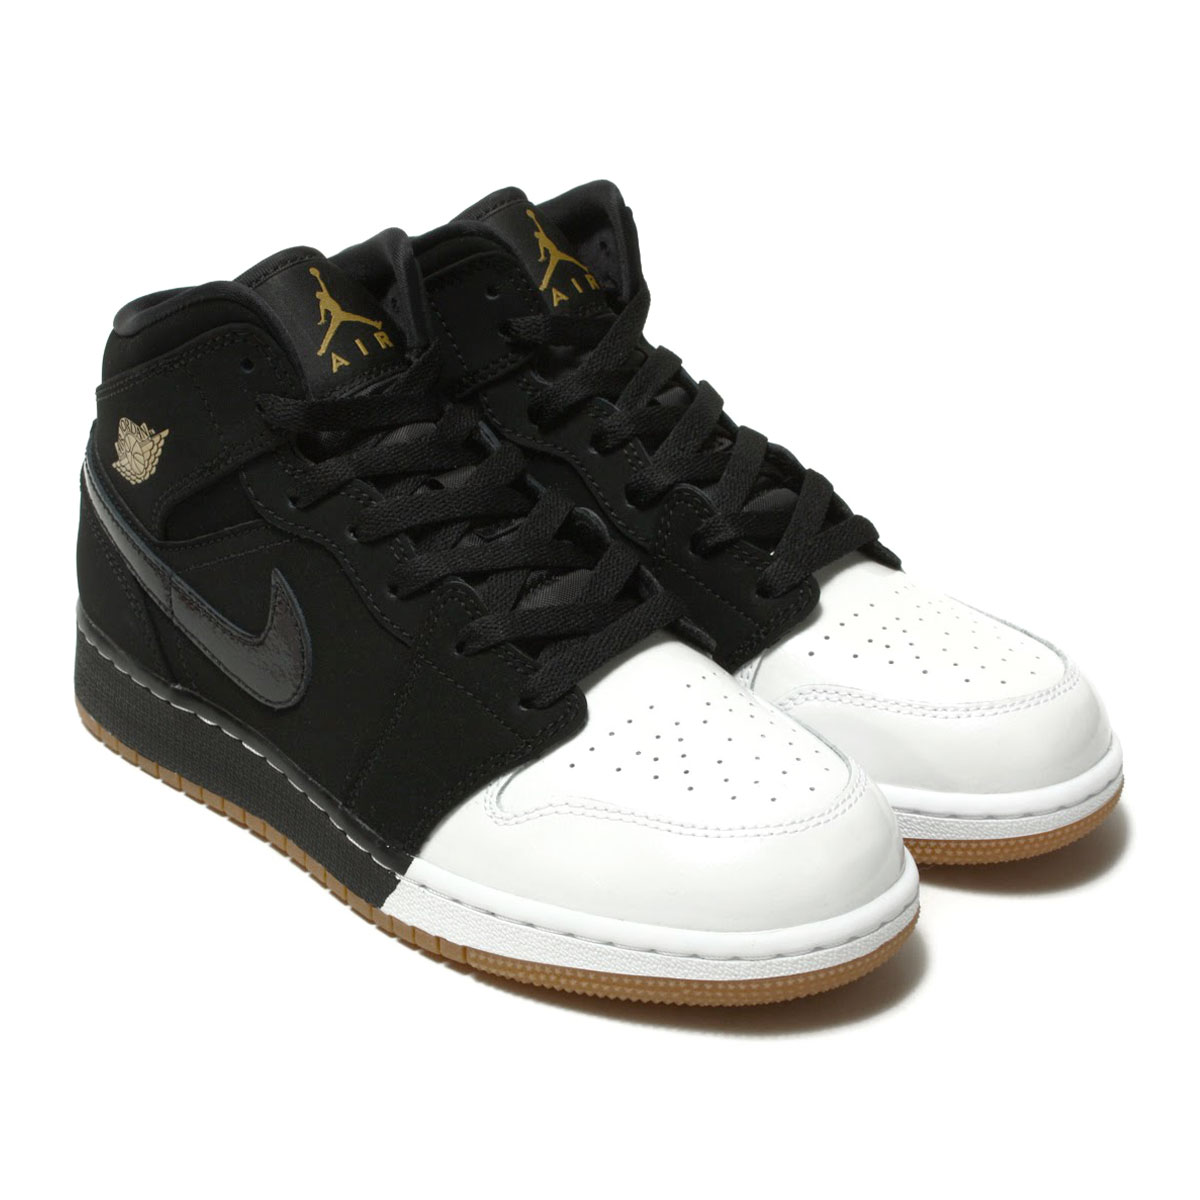 b997563300d1f NIKE AIR JORDAN 1 MID GG (Nike Air Jordan 1 mid GG) BLACK METALLIC GOLD- WHITE-GUM MED BROWN 18SP-I